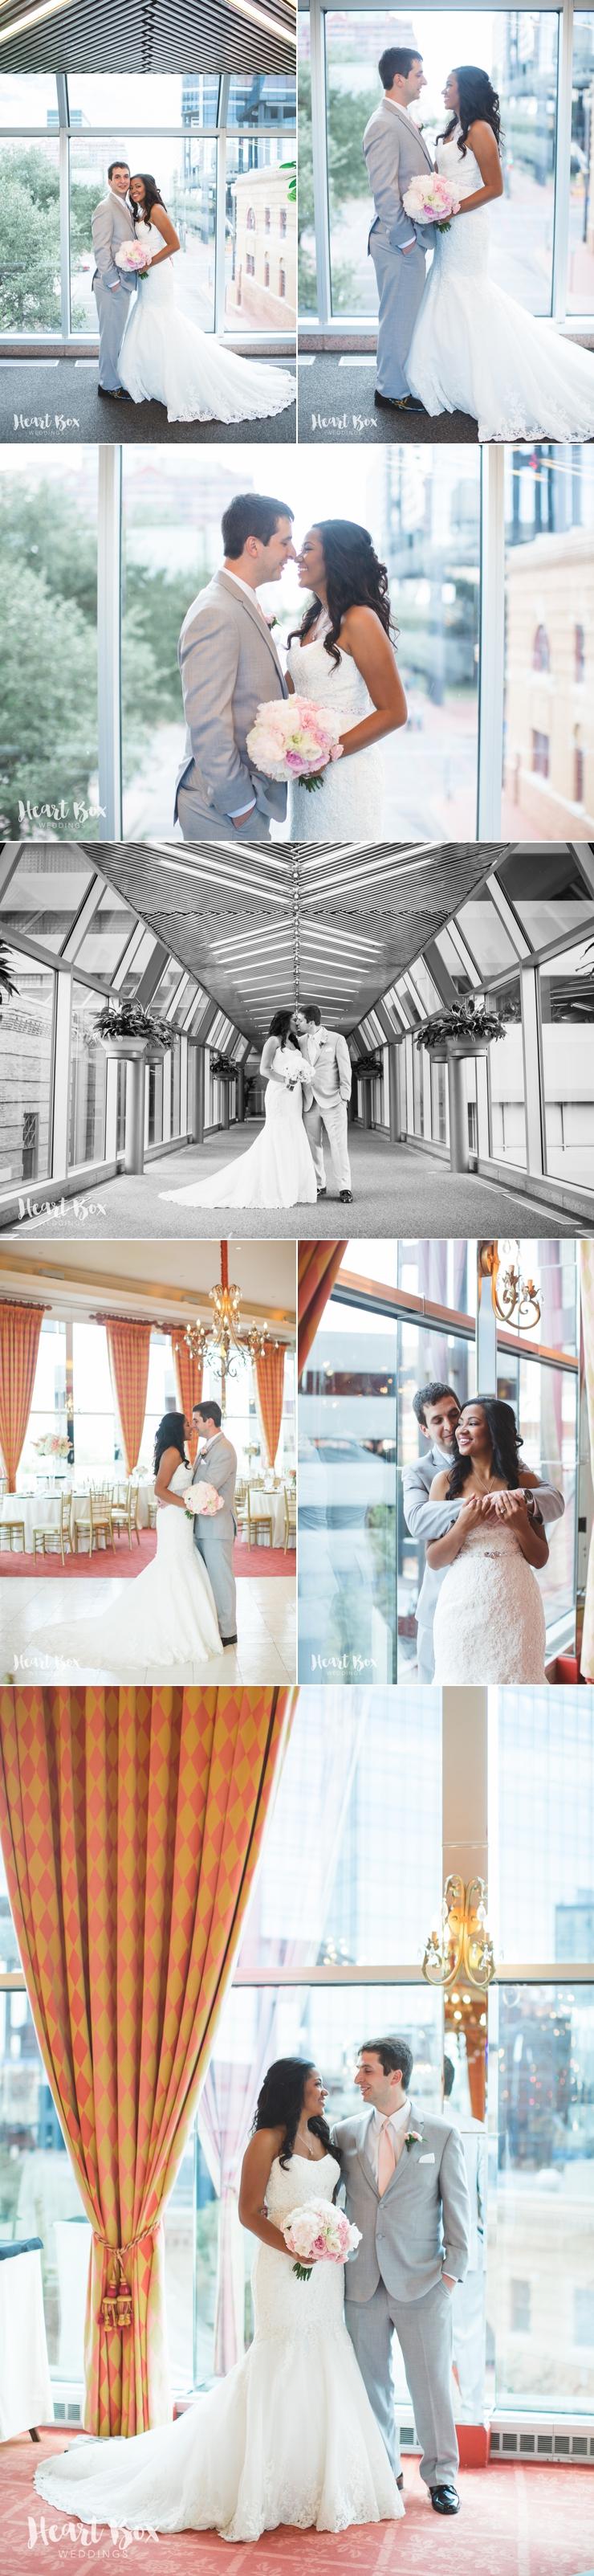 Smith Wedding Blog Collages 6.jpg